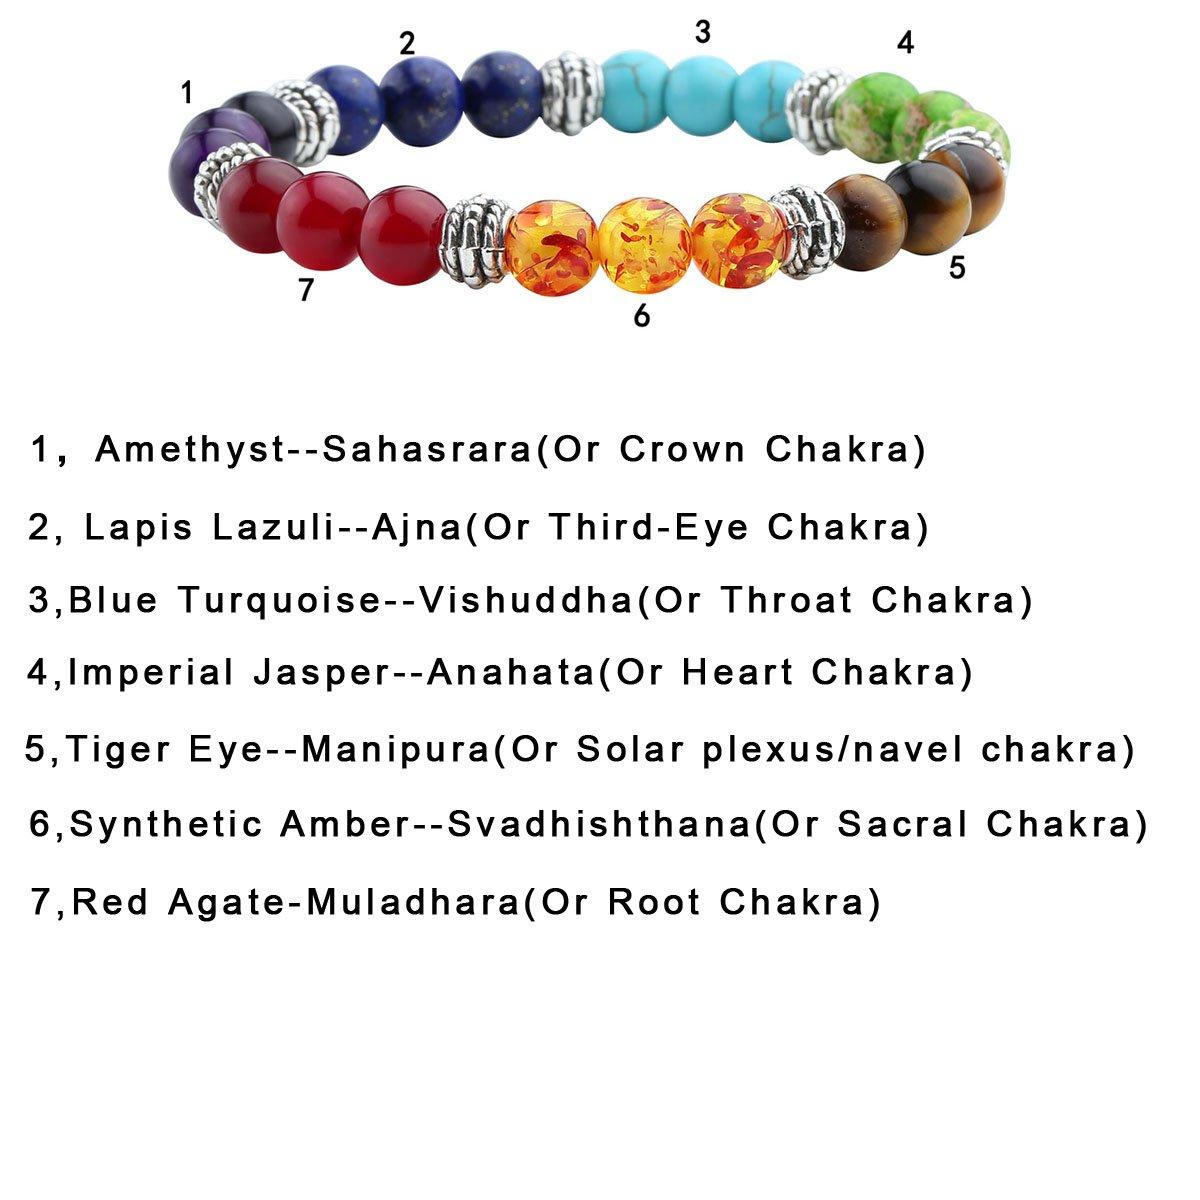 Top Plaza 7 Chakra Reiki Healing Crystals Yoga Balance Irregular Shape Polished Tumbled Palm Stones W/ 7 Chakra Healing Crystal Bracelet (7 Chakra Bracelet Without Charm) by Top Plaza (Image #5)